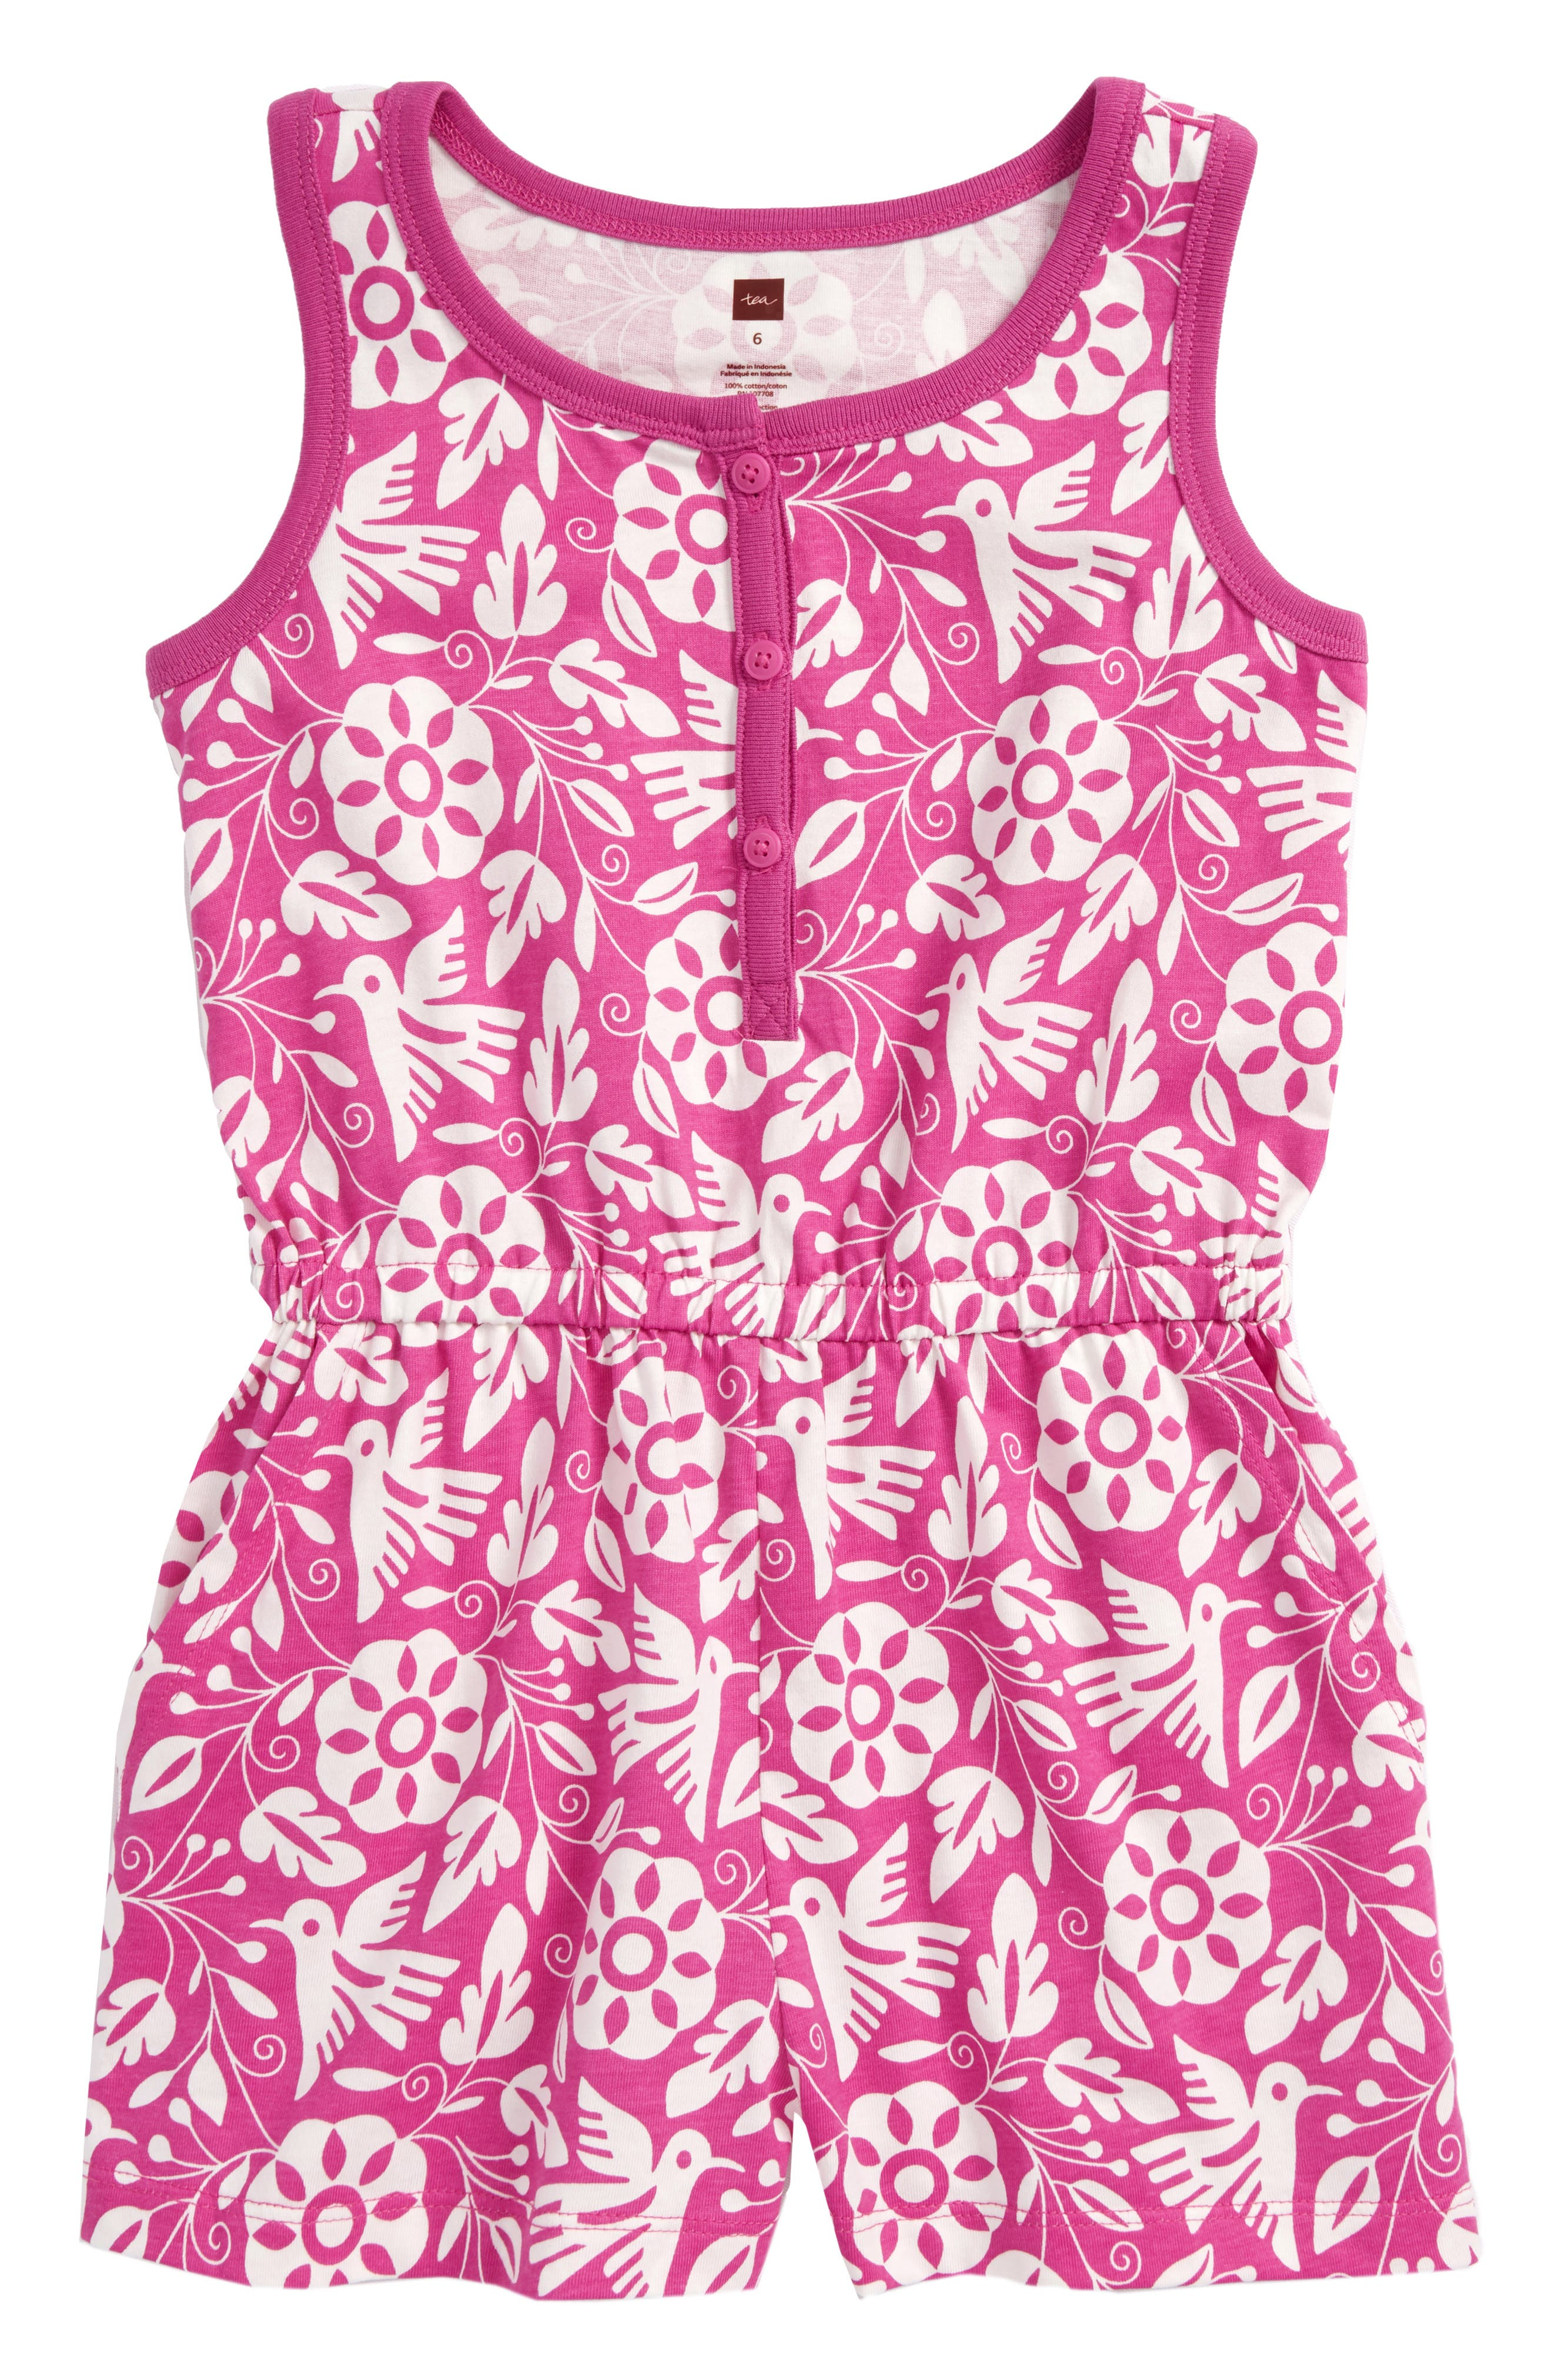 Alternate Image 1 Selected - Tea Collection Hawaiian Knit Romper (Toddler Girls, Little Girls & Big Girls)